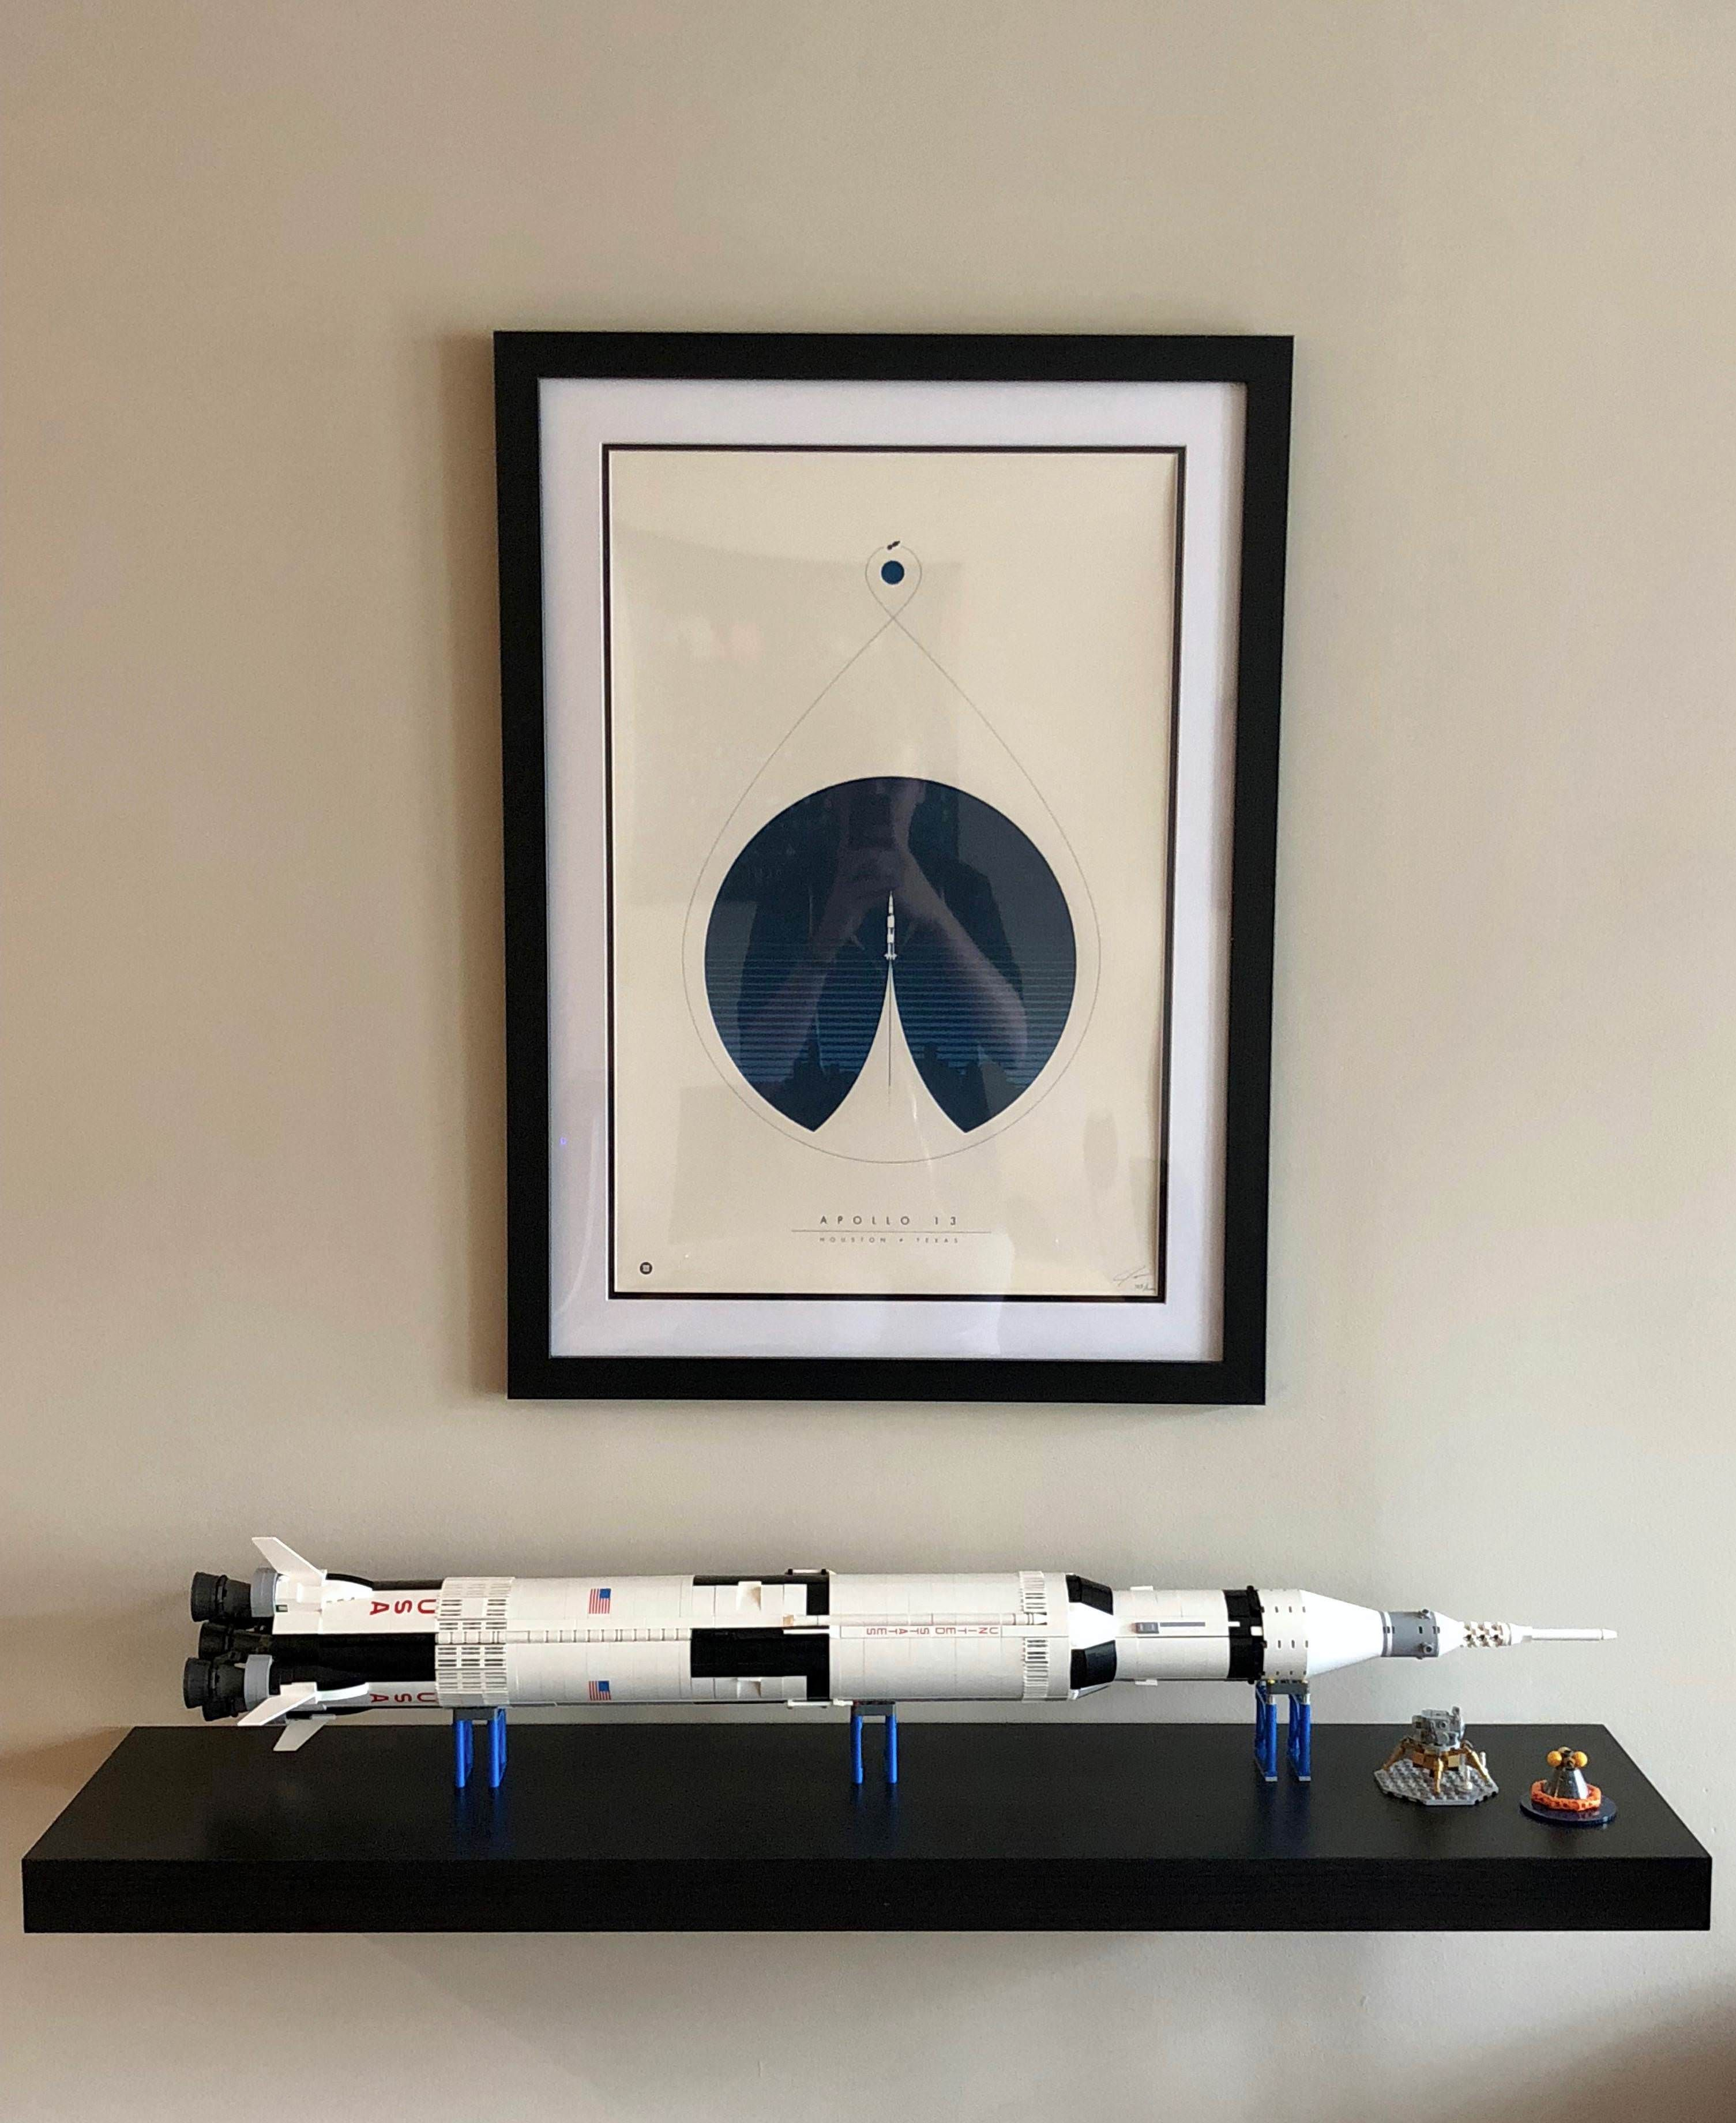 Got The Nasa Saturn V Lego Set For Christmas Felt Like A Kid Again Matches My Apollo 13 Print Perfectly Lego Display Lego Sets Lego